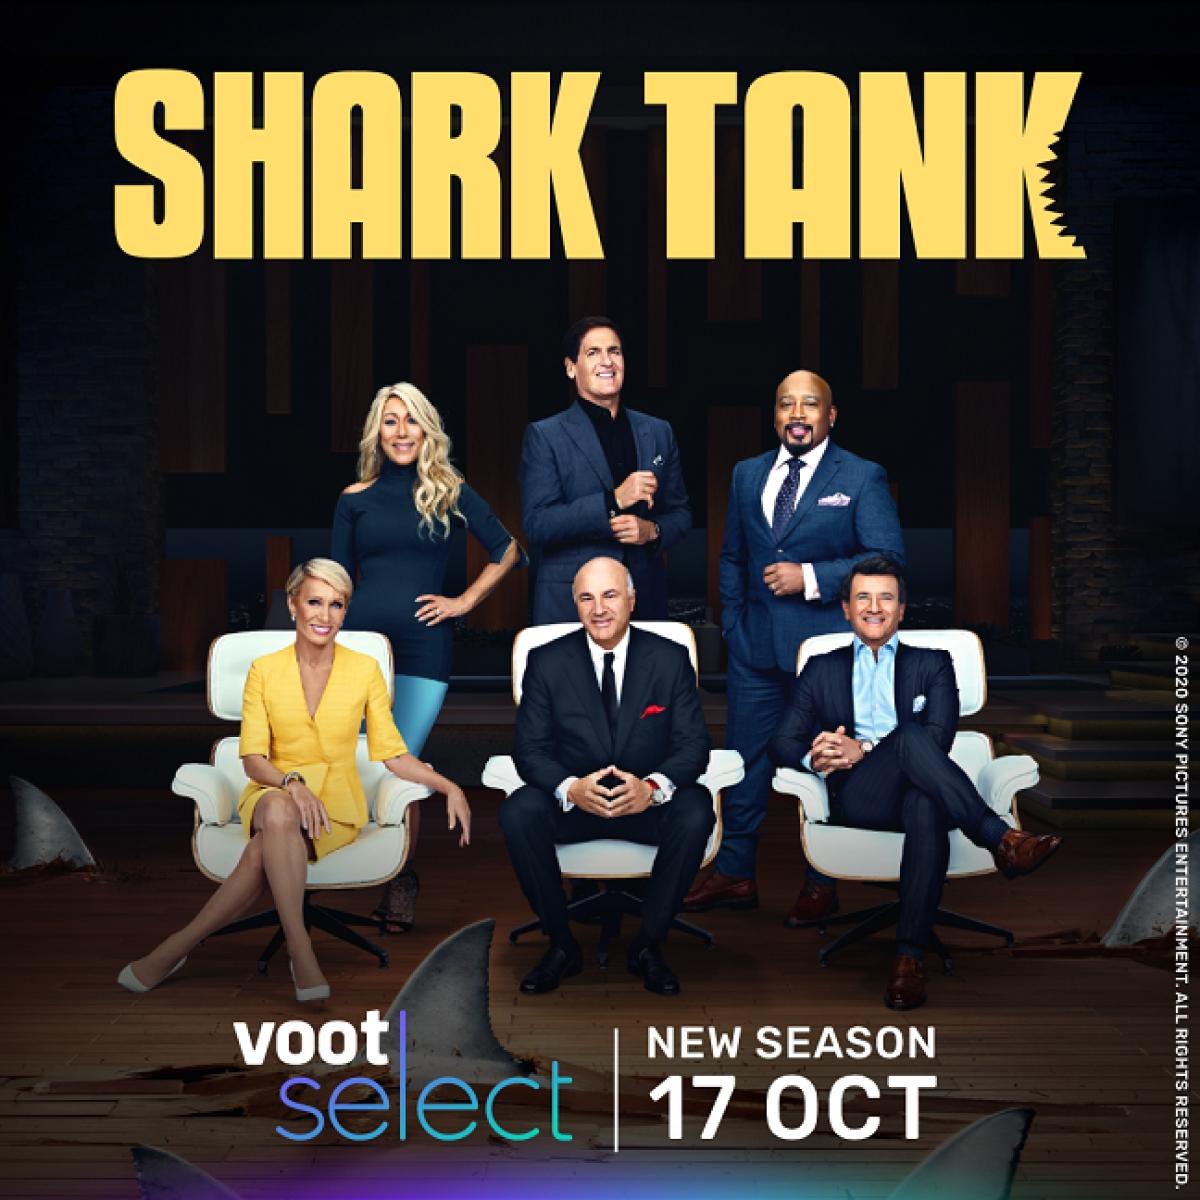 Voot Select to showcase fresh episodes of Shark Tank – Season 12 alongside US telecast